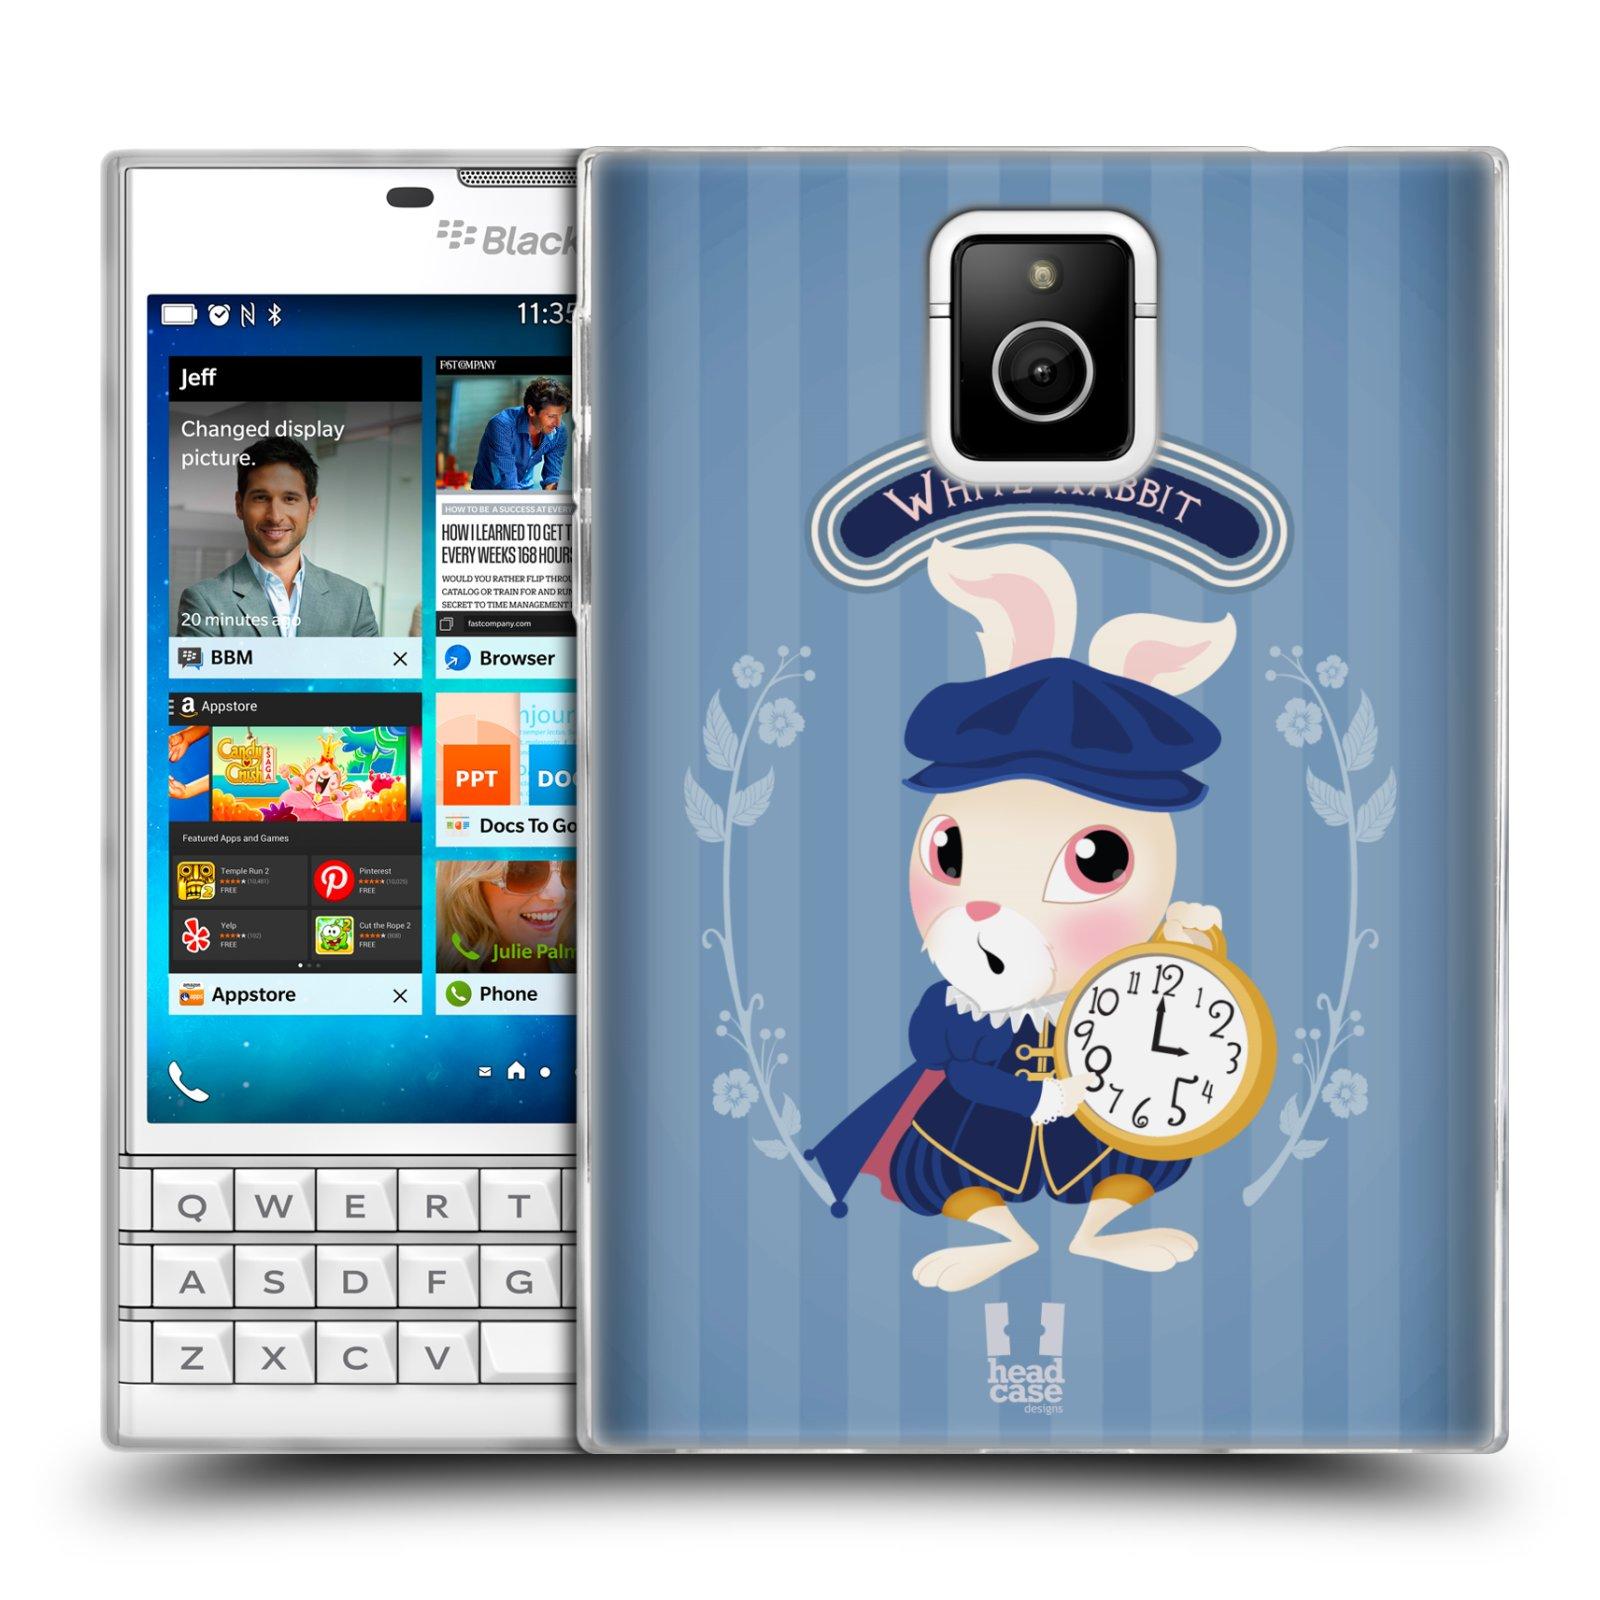 HEAD CASE silikonový obal na mobil Blackberry PASSPORT vzor Alenka v říši divů králíček